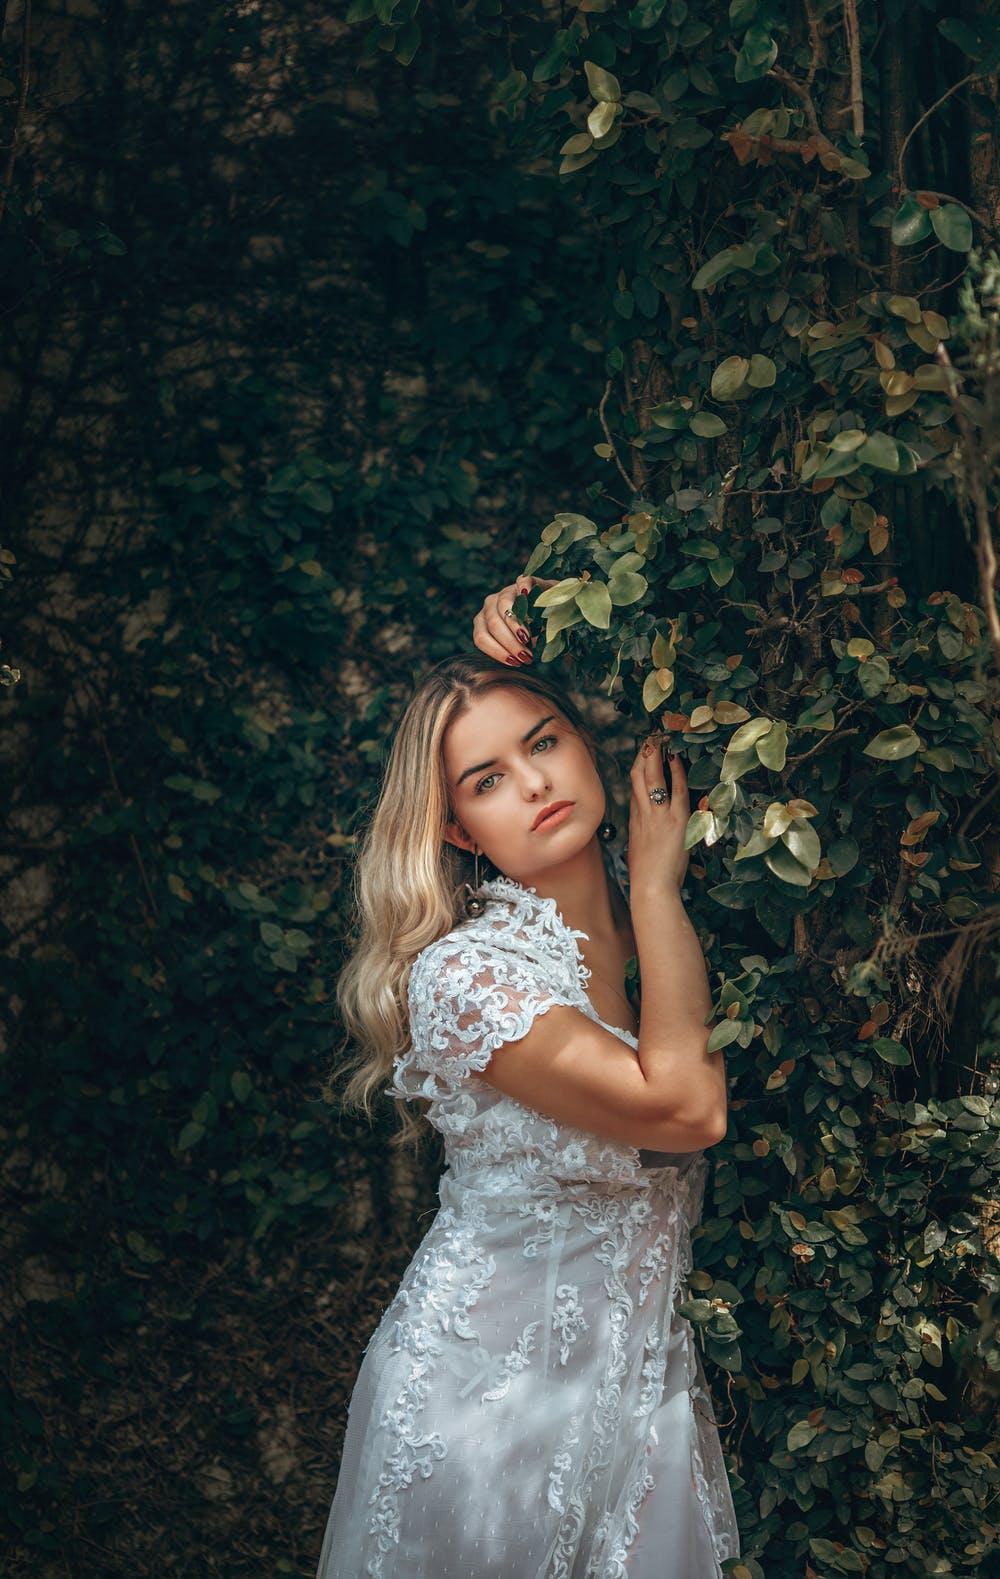 Girls in bush